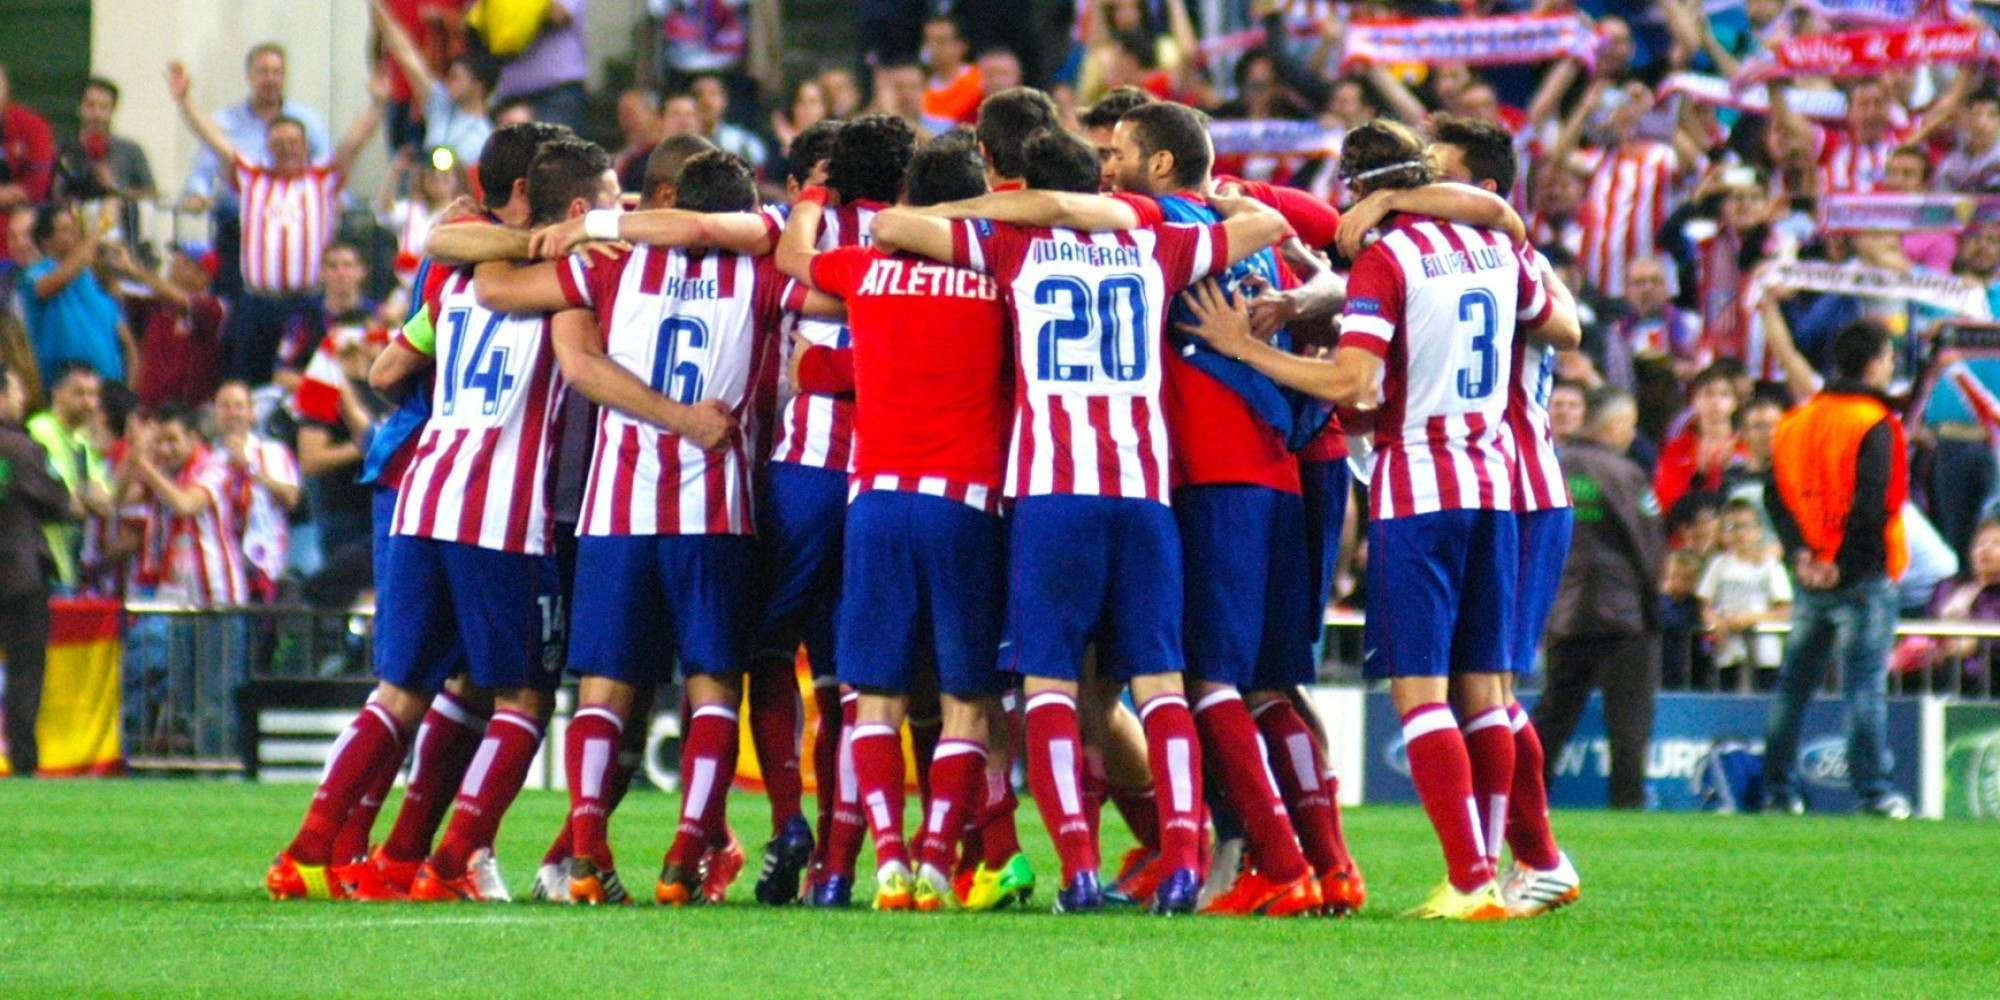 Atletico ke Final Usai Singkirkan Tiga Juara webet188